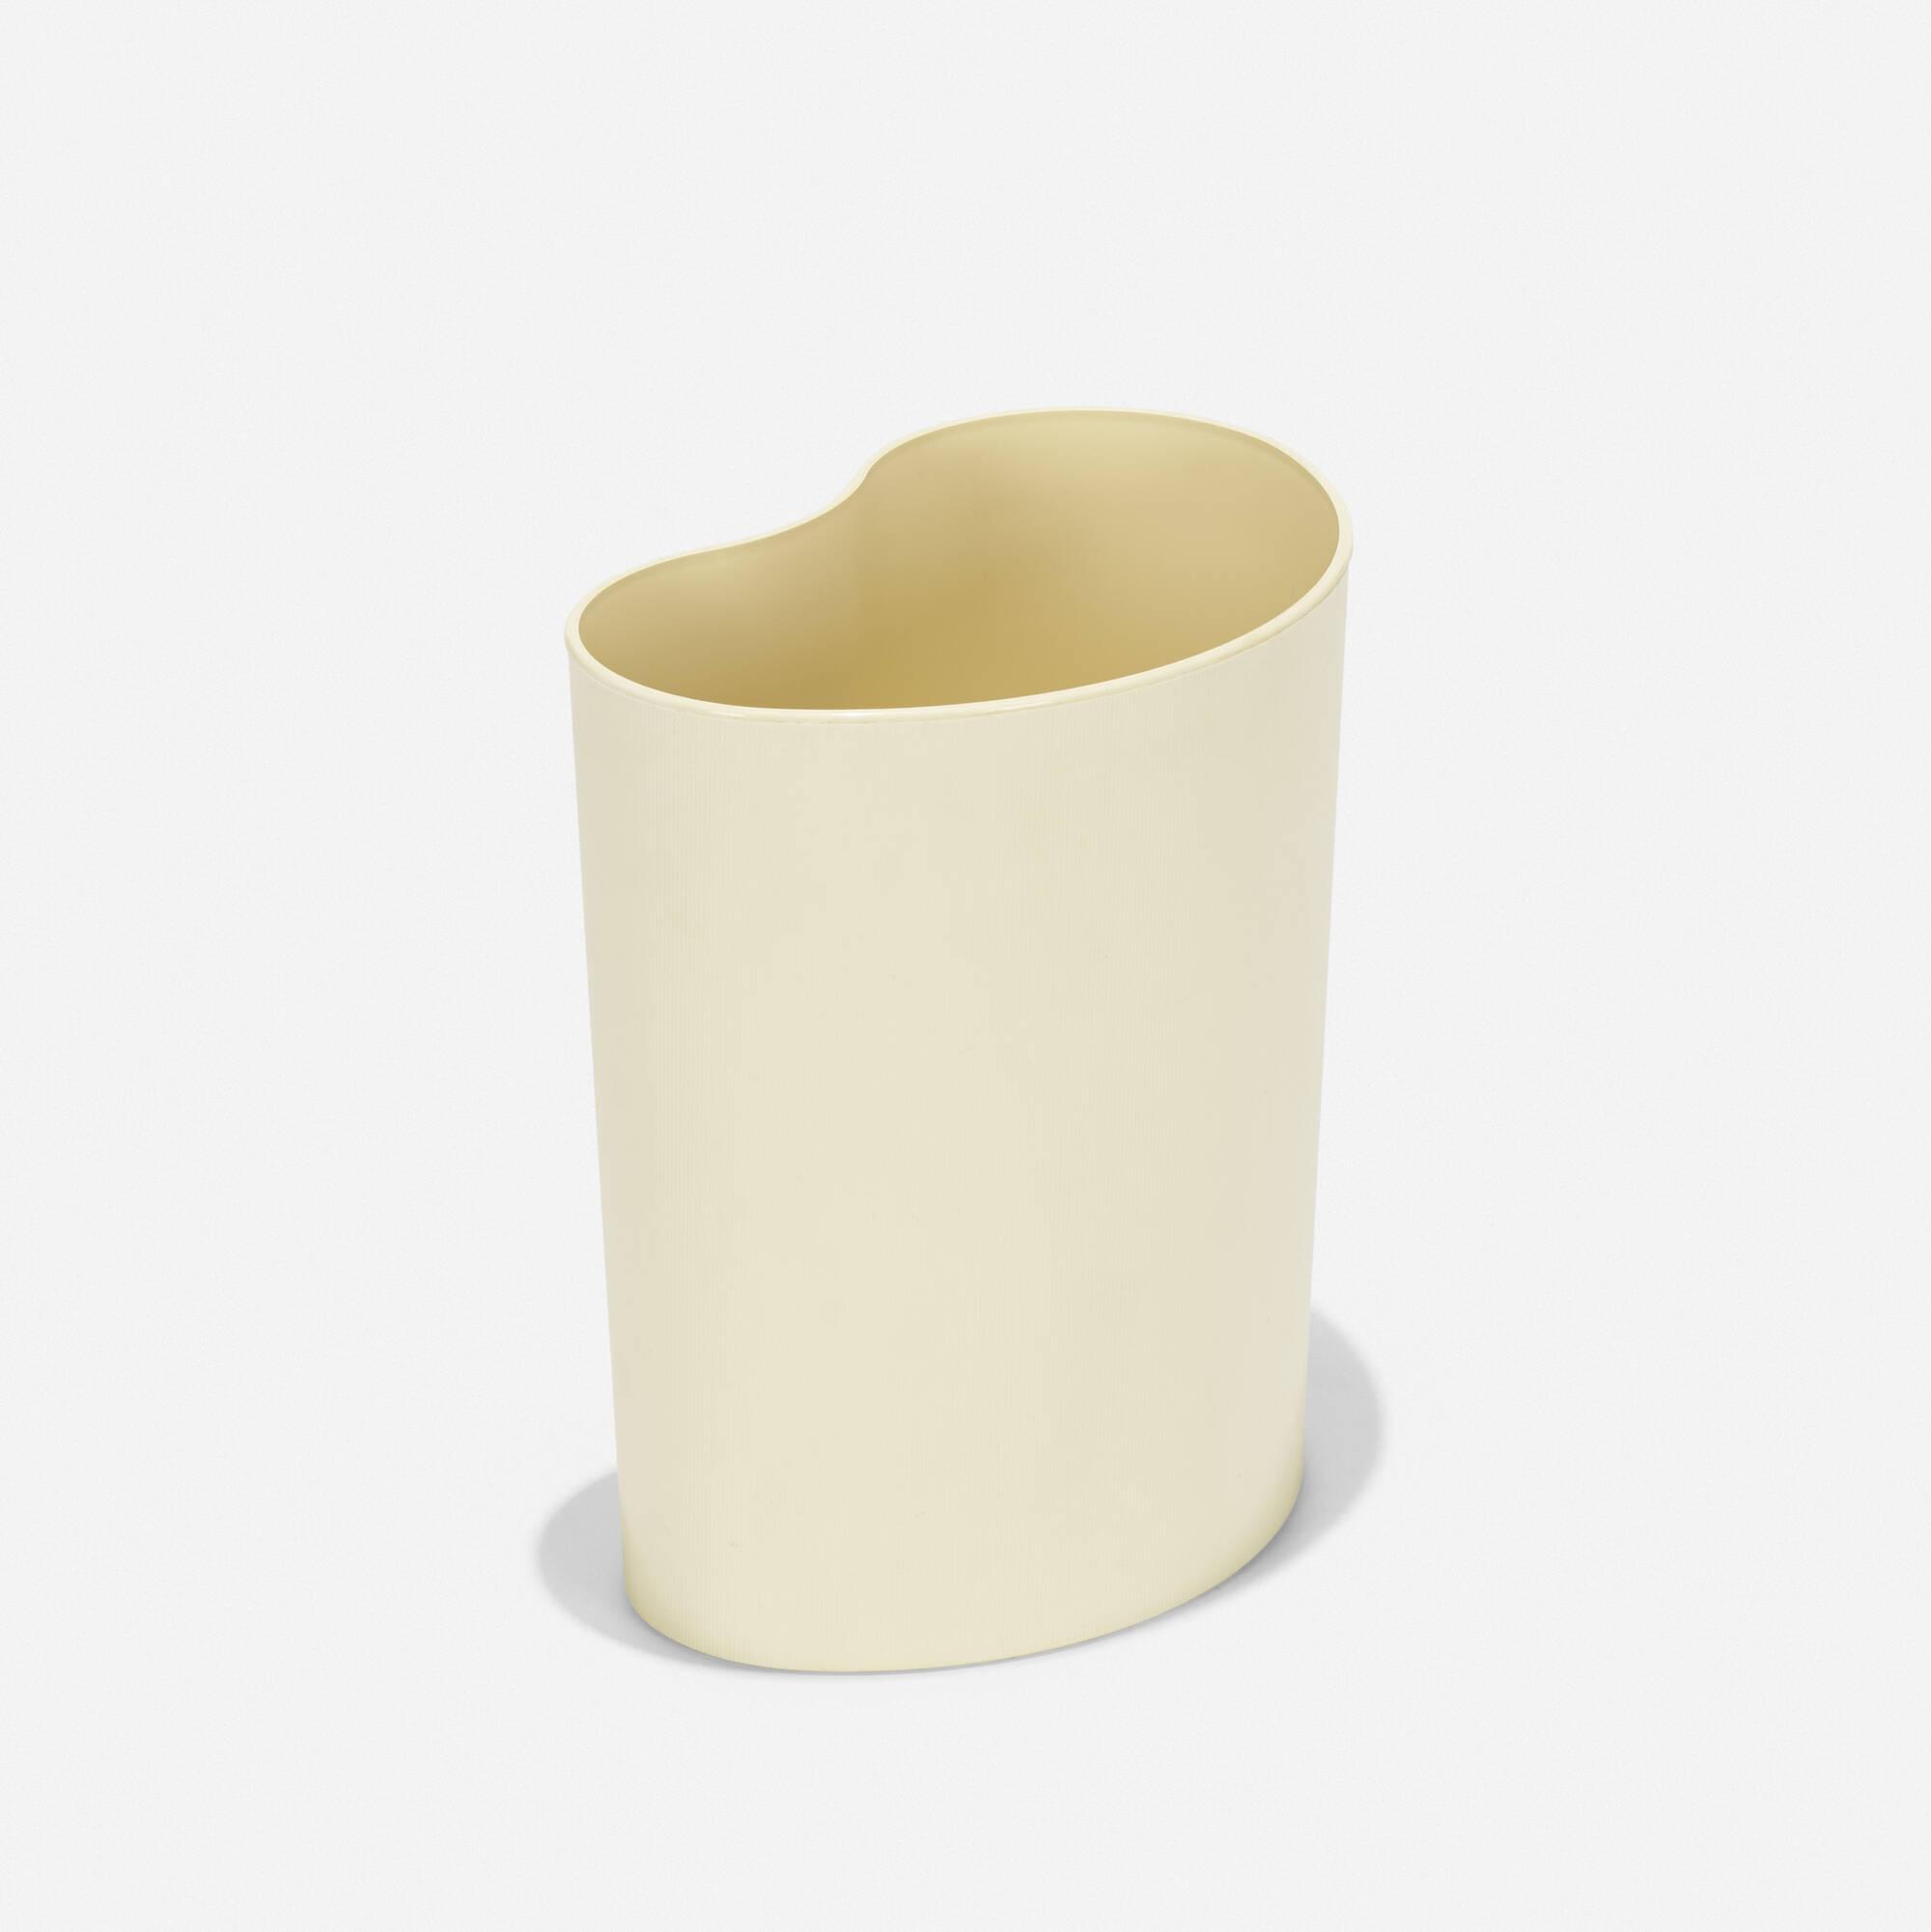 203: Enzo Mari / Chio wastepaper basket (1 of 2)